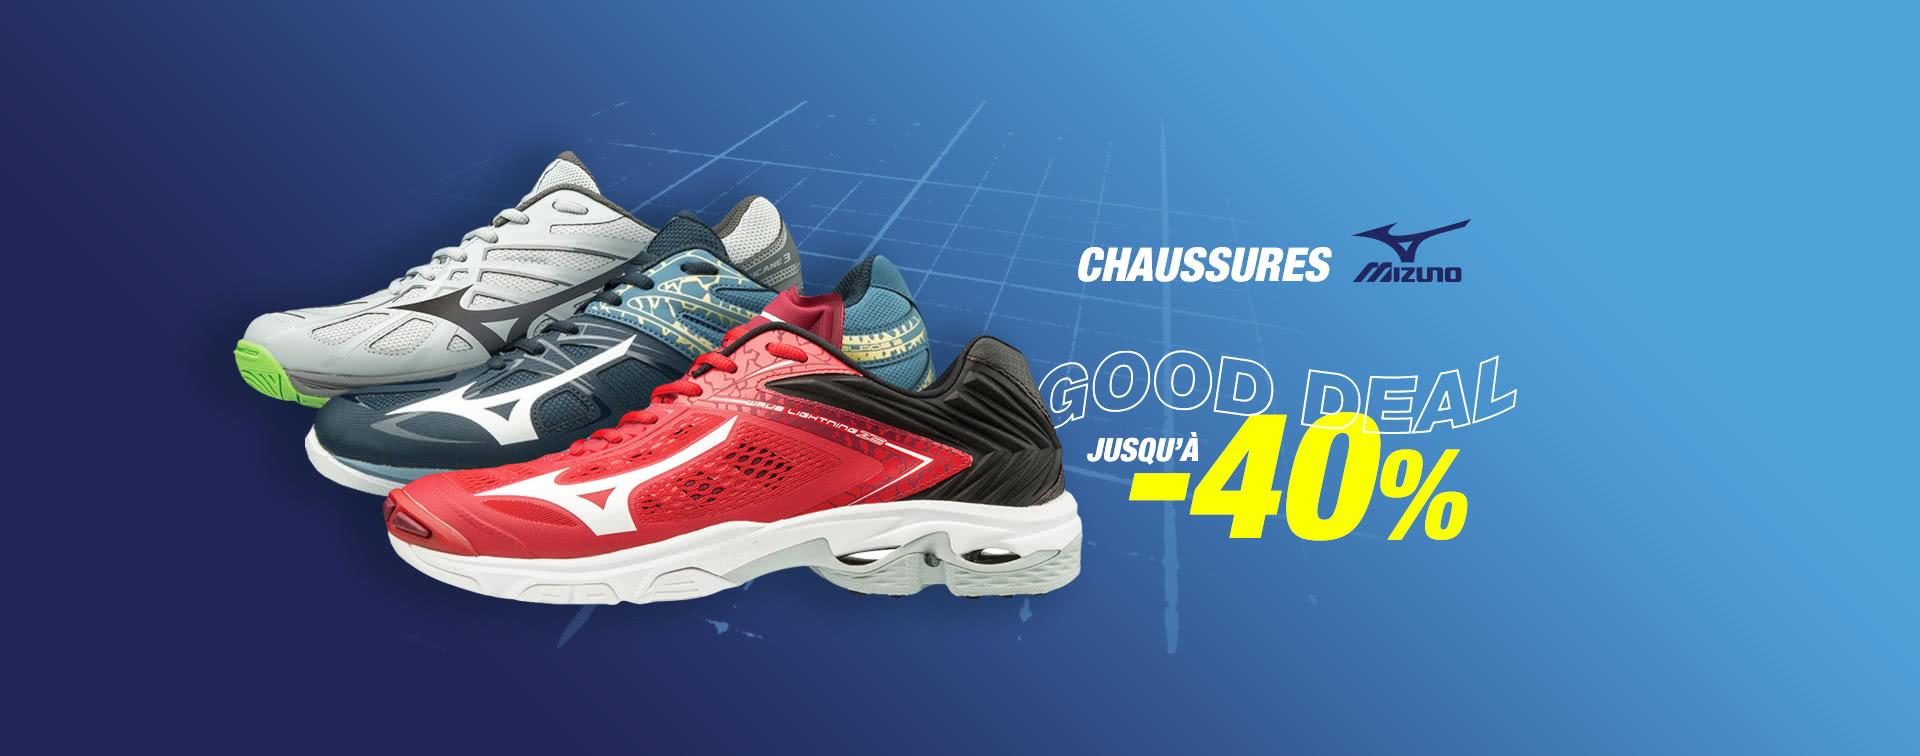 Chaussures Mizuno Good Deal Jusqu'à -40%